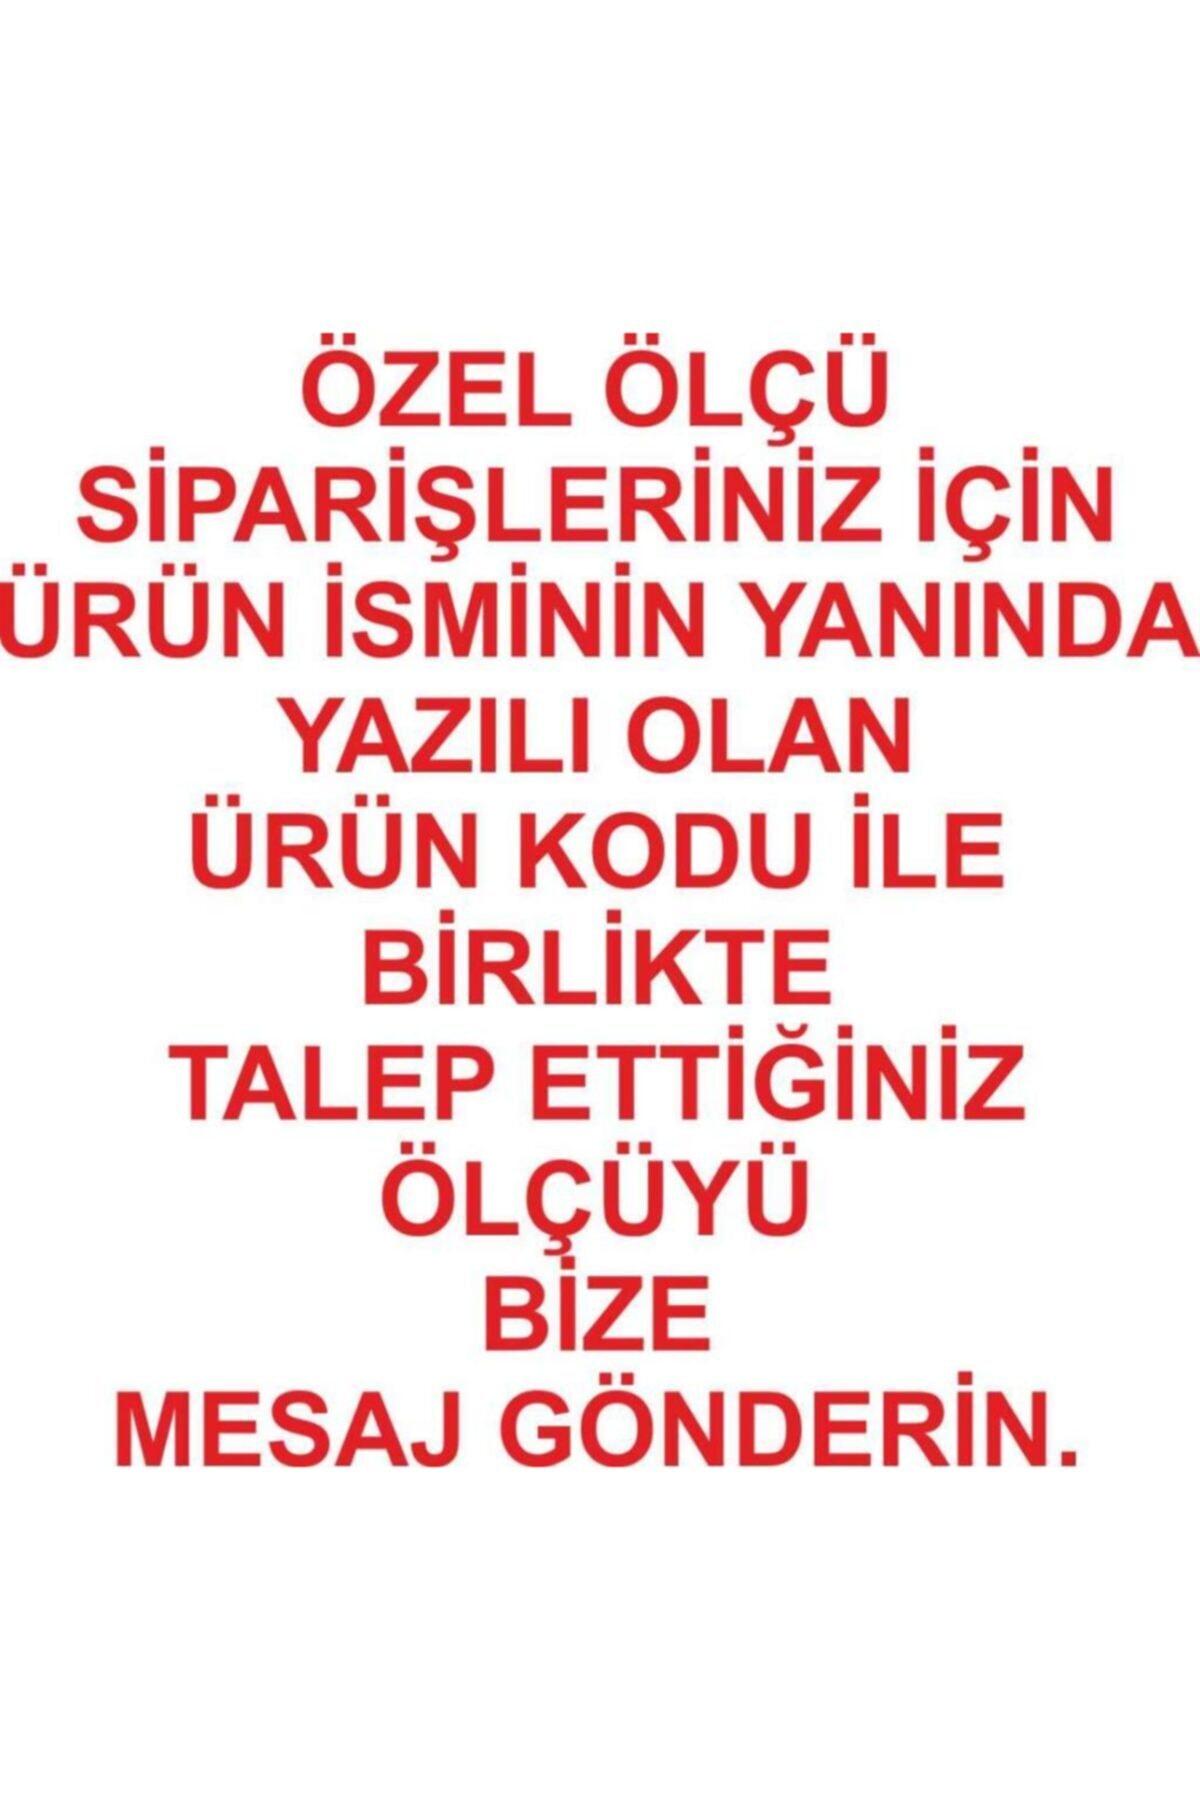 Sticker Fabrikası Kartal Türk Bayrağı Ay Yıldız Sticker 01135 20x20 cm 2